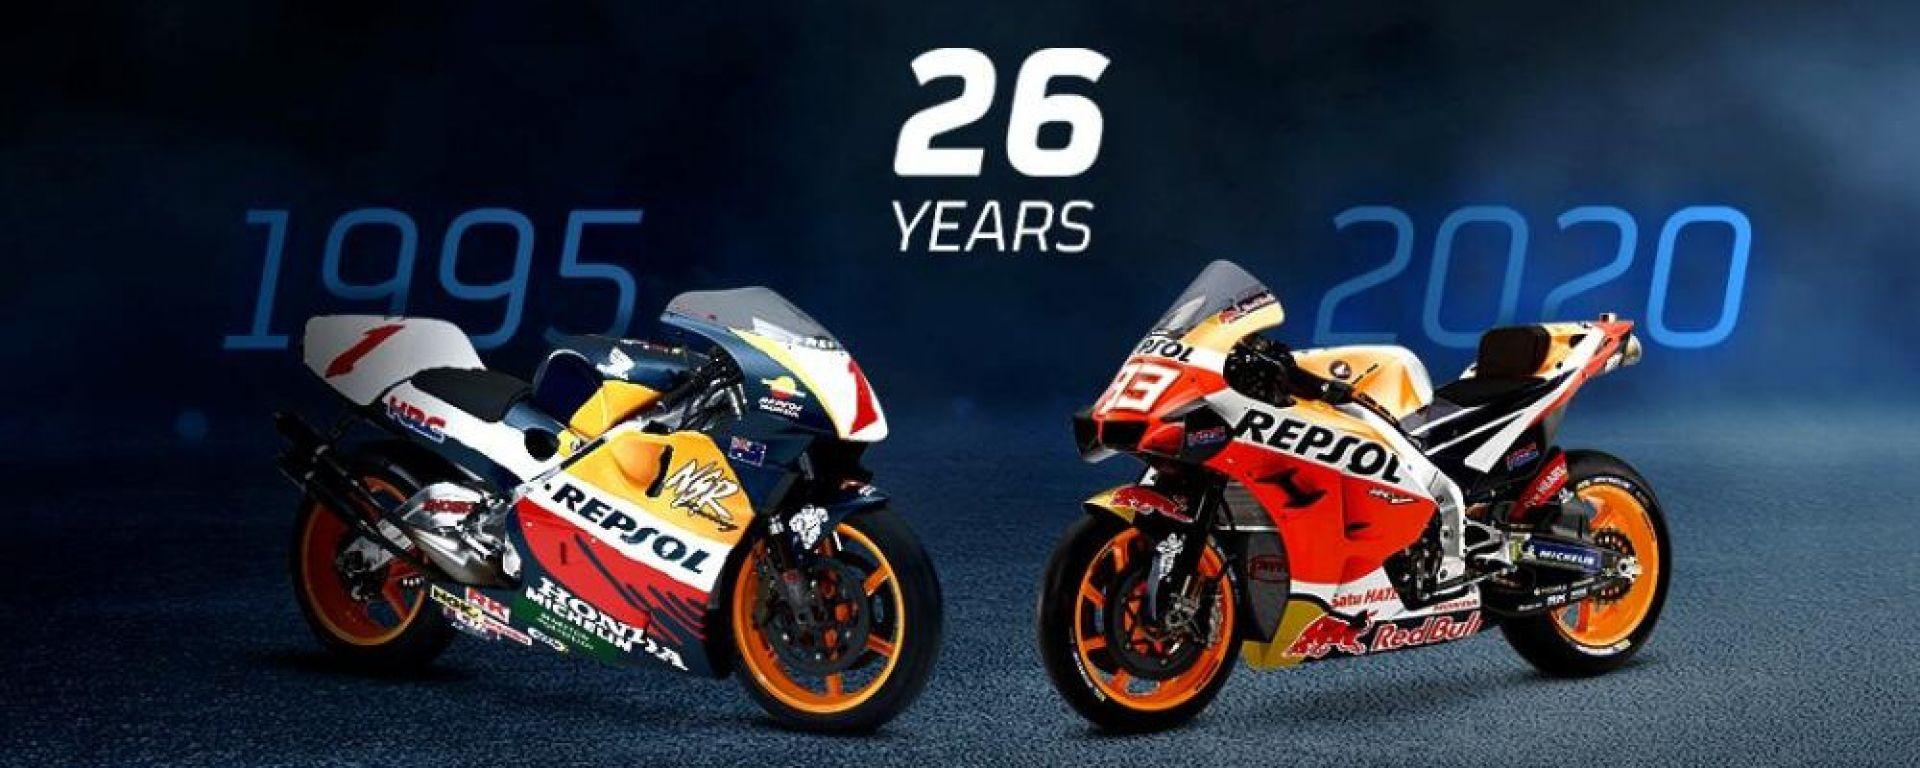 Honda Repsol 26 anni insieme